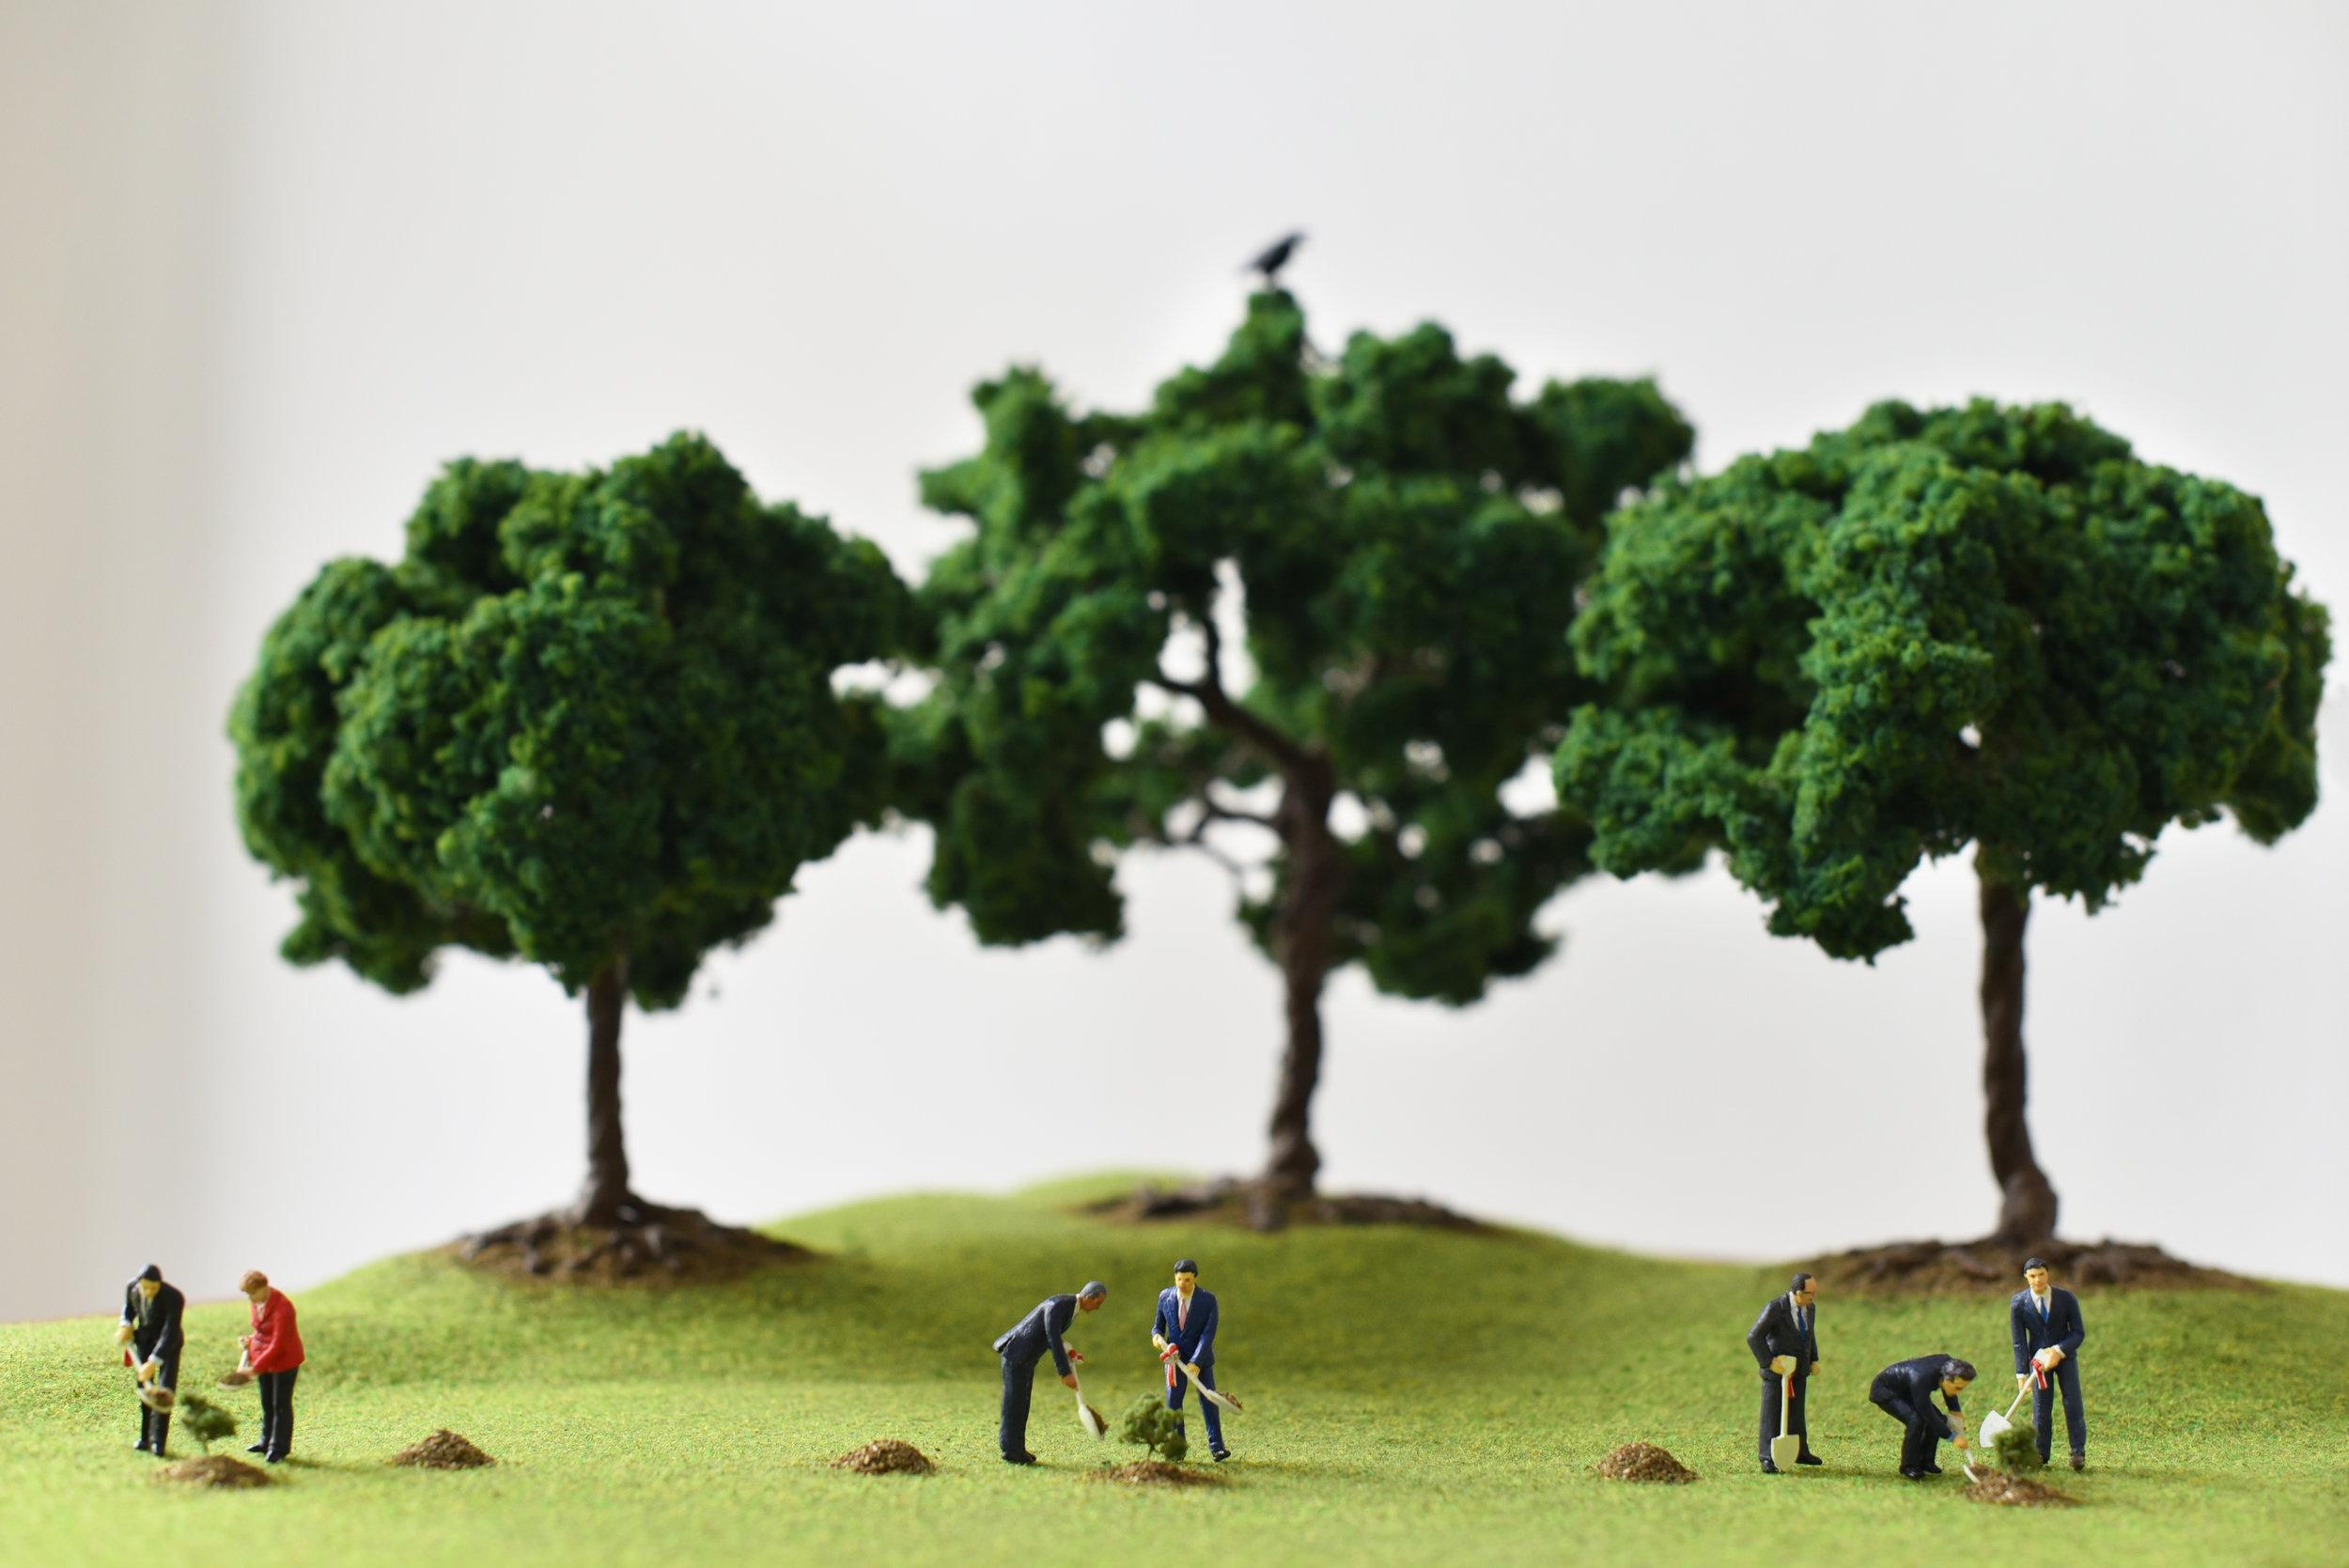 The Pathfinders, the Hand and the Trees - Olivia Hernaïz (2).jpg